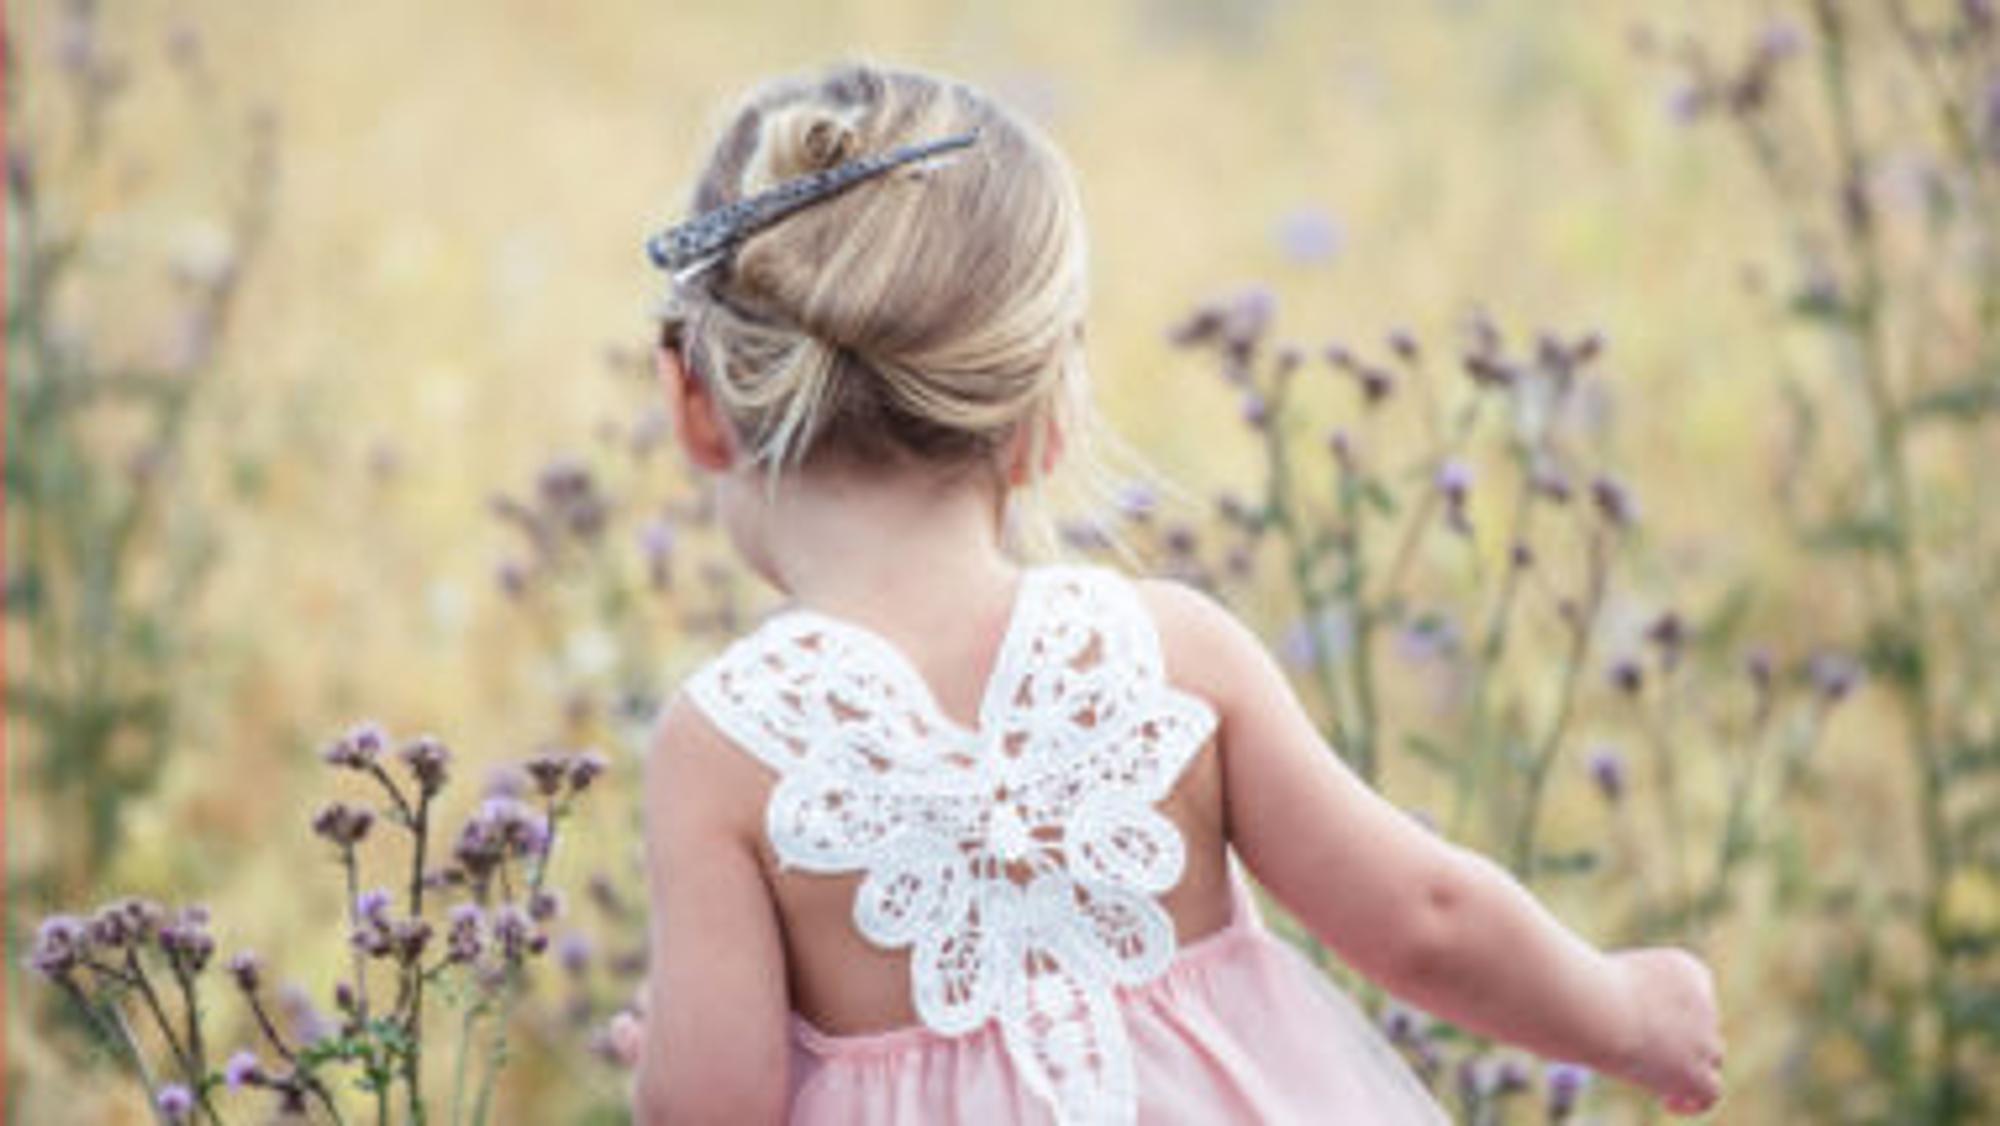 Blondes kind im rosa Kleid